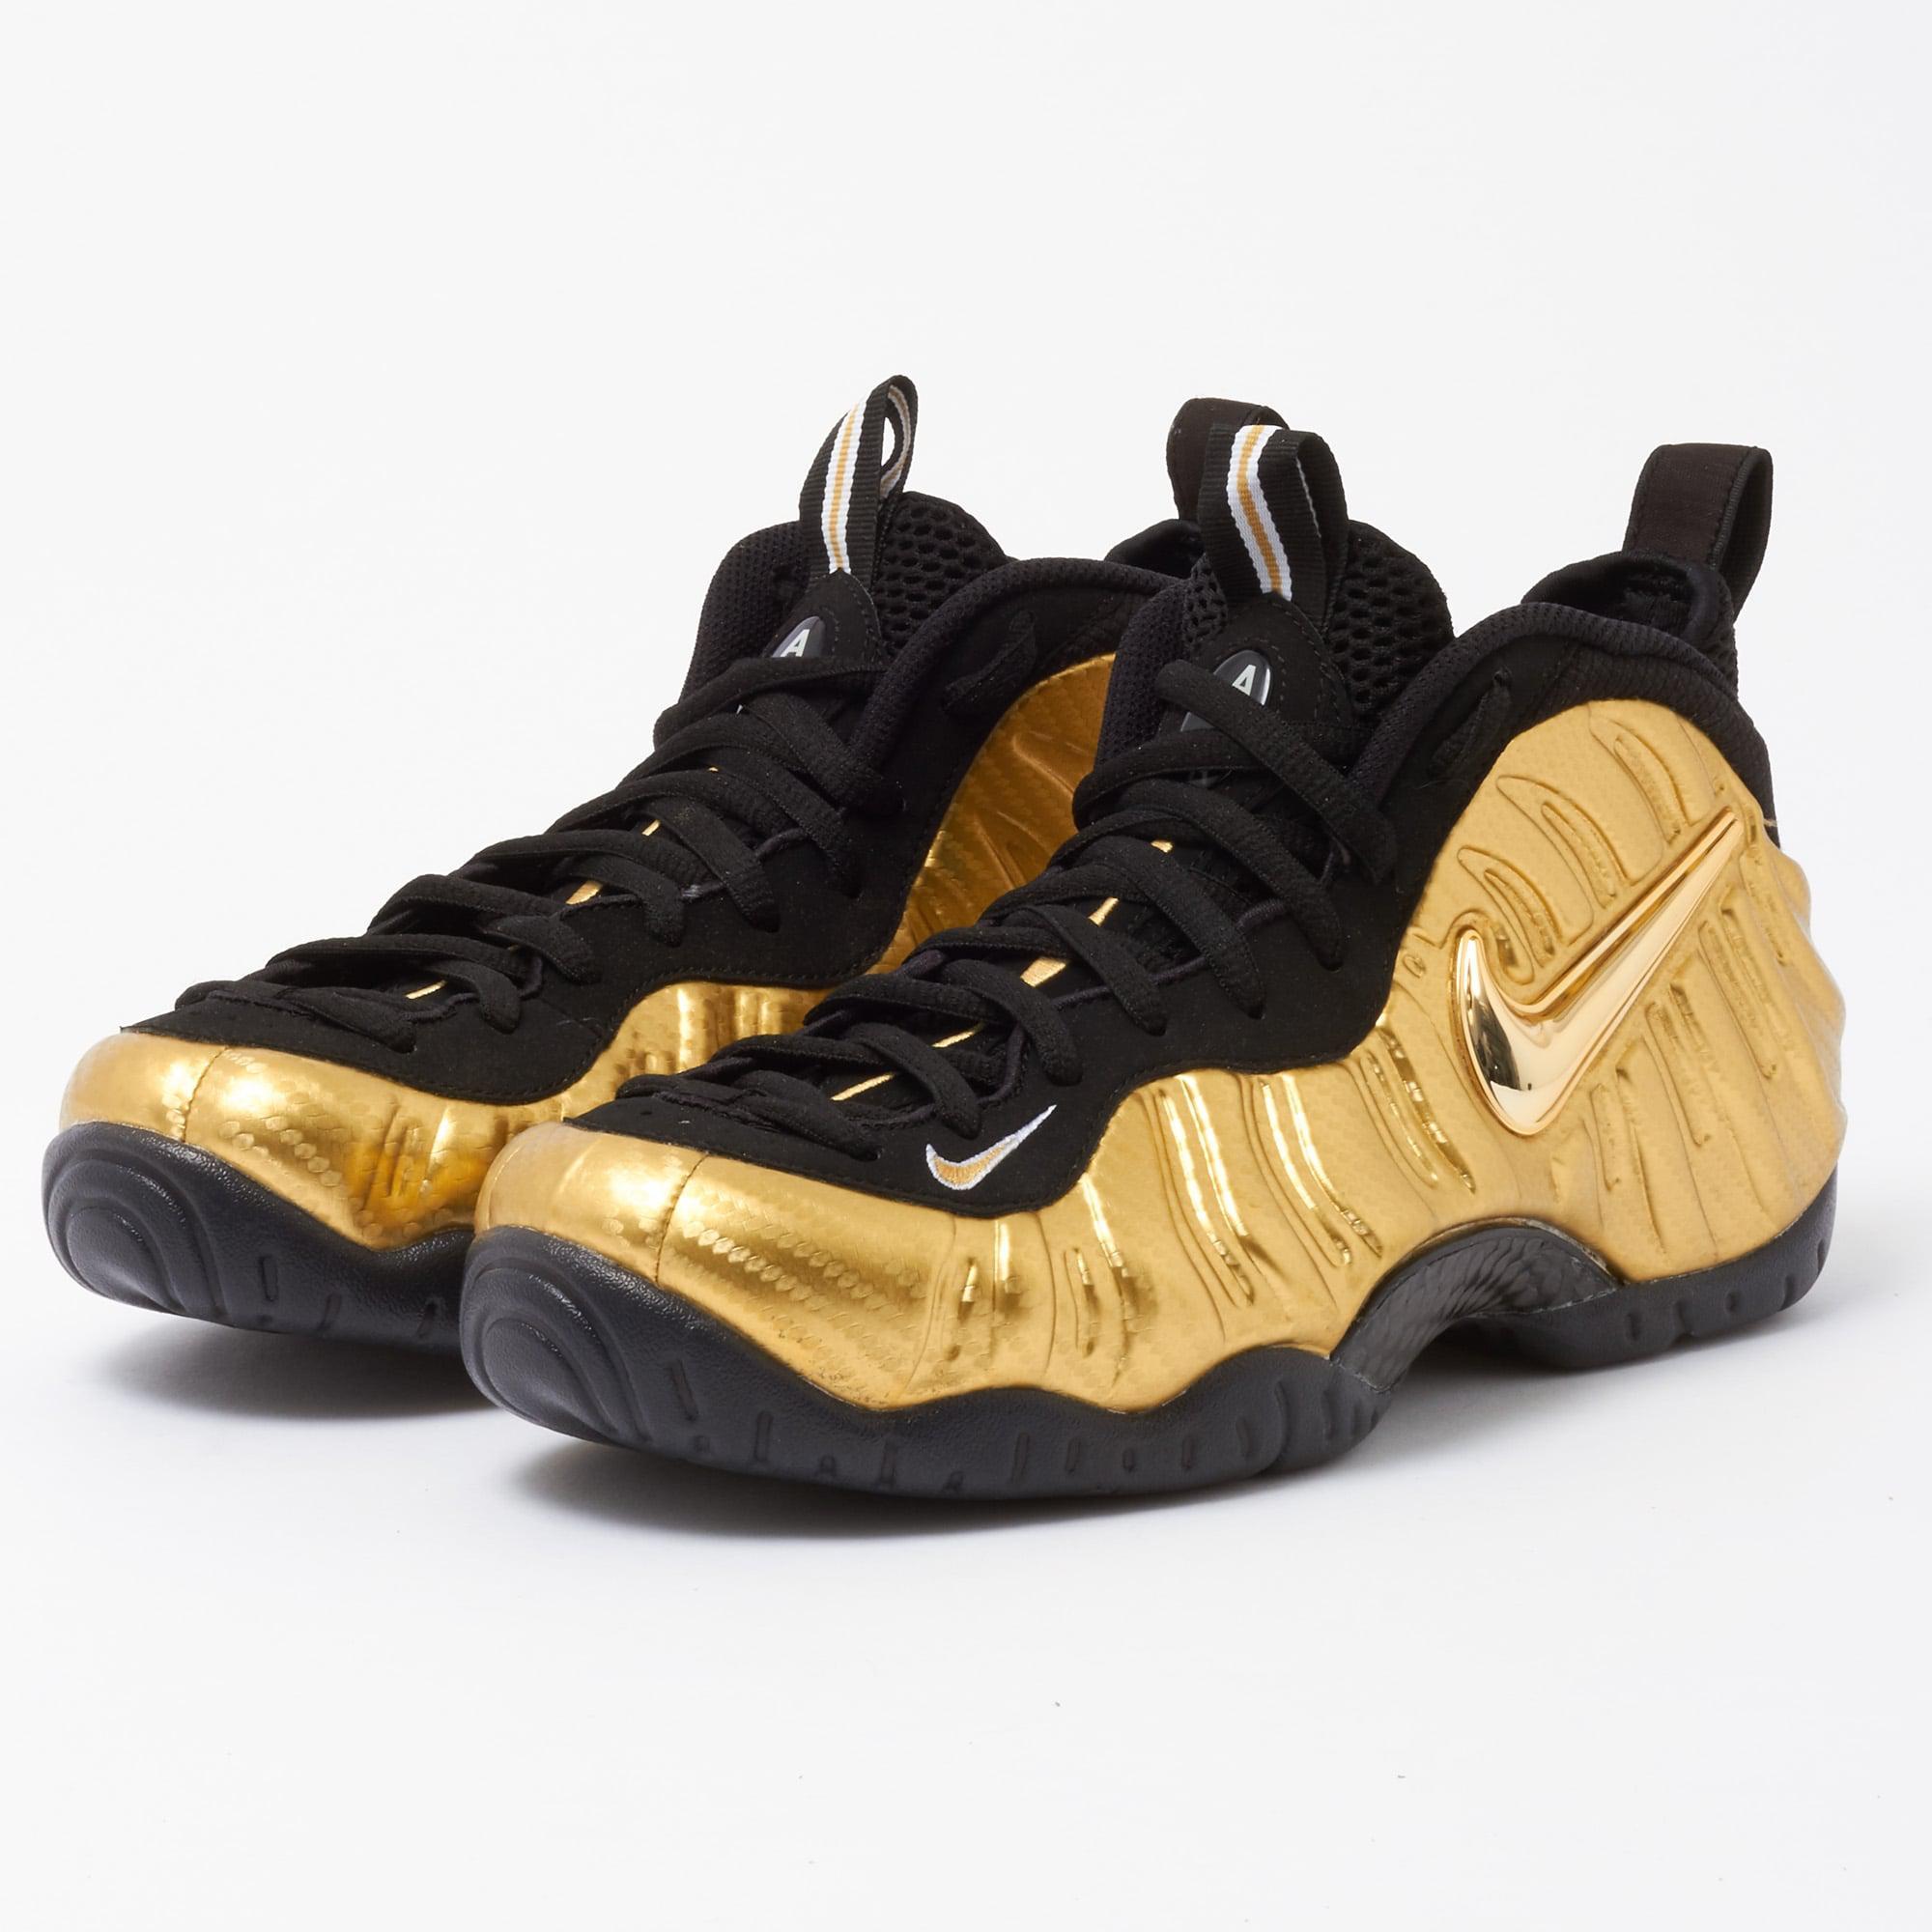 84c6cf52b9f99 Lyst - Nike Air Foamposite Pro - Metallic Gold   Black in Black for Men